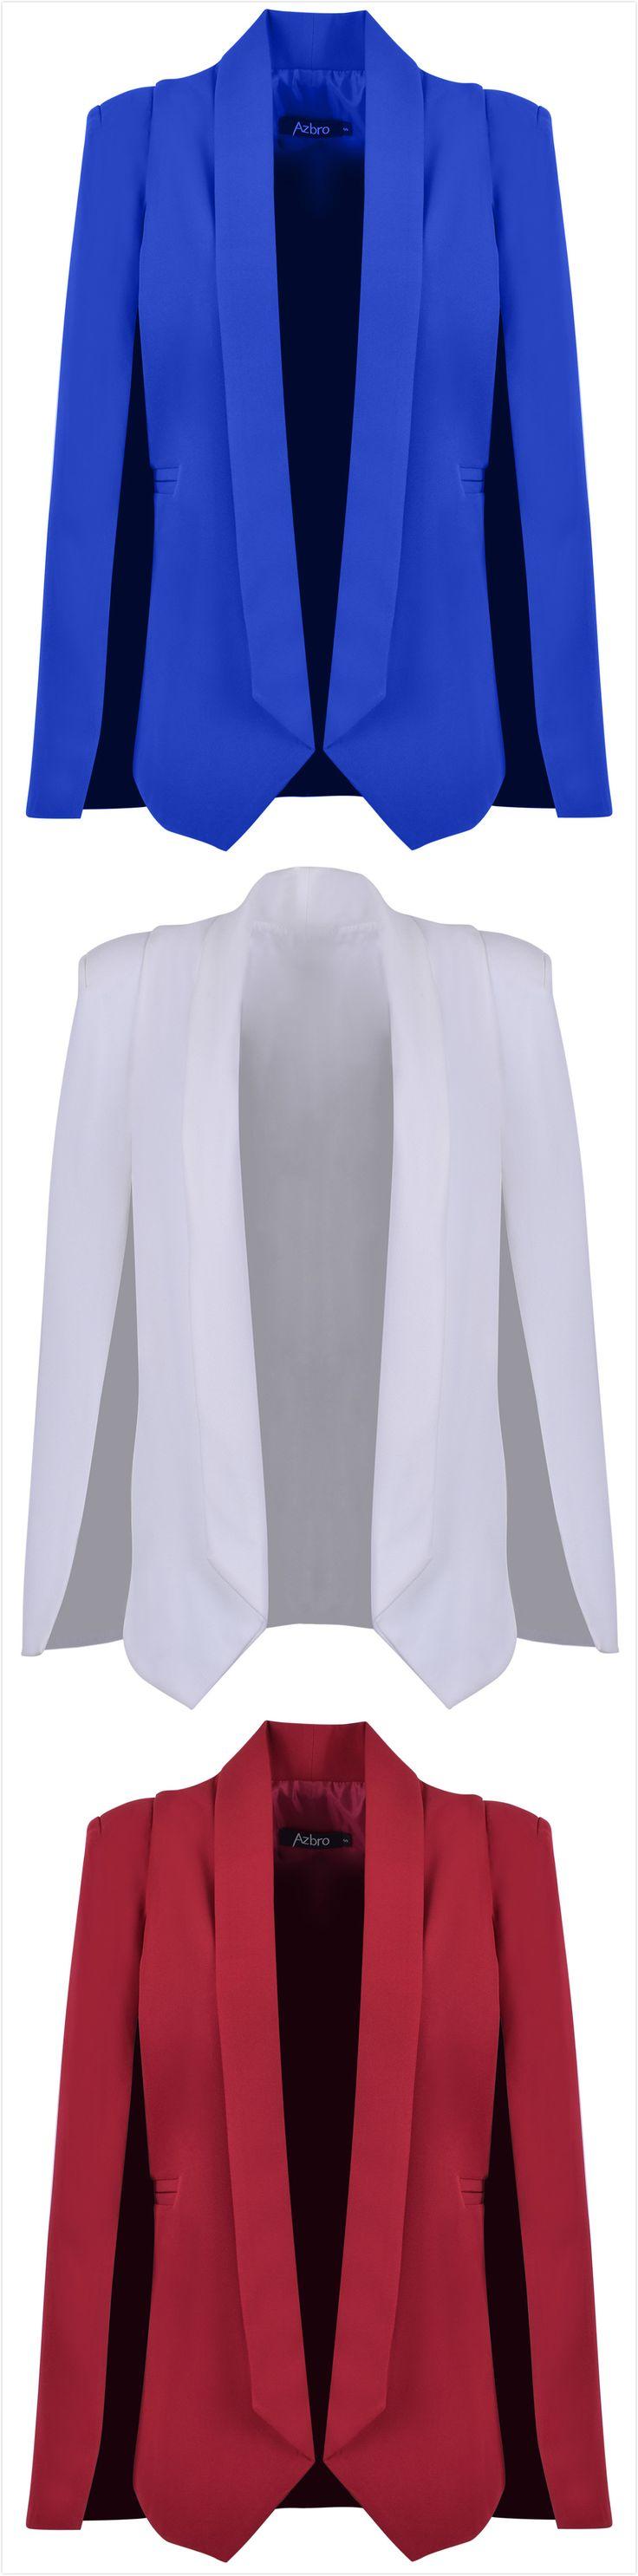 Women's Fashion Solid Shawl Collar Open Front Cape Blazer